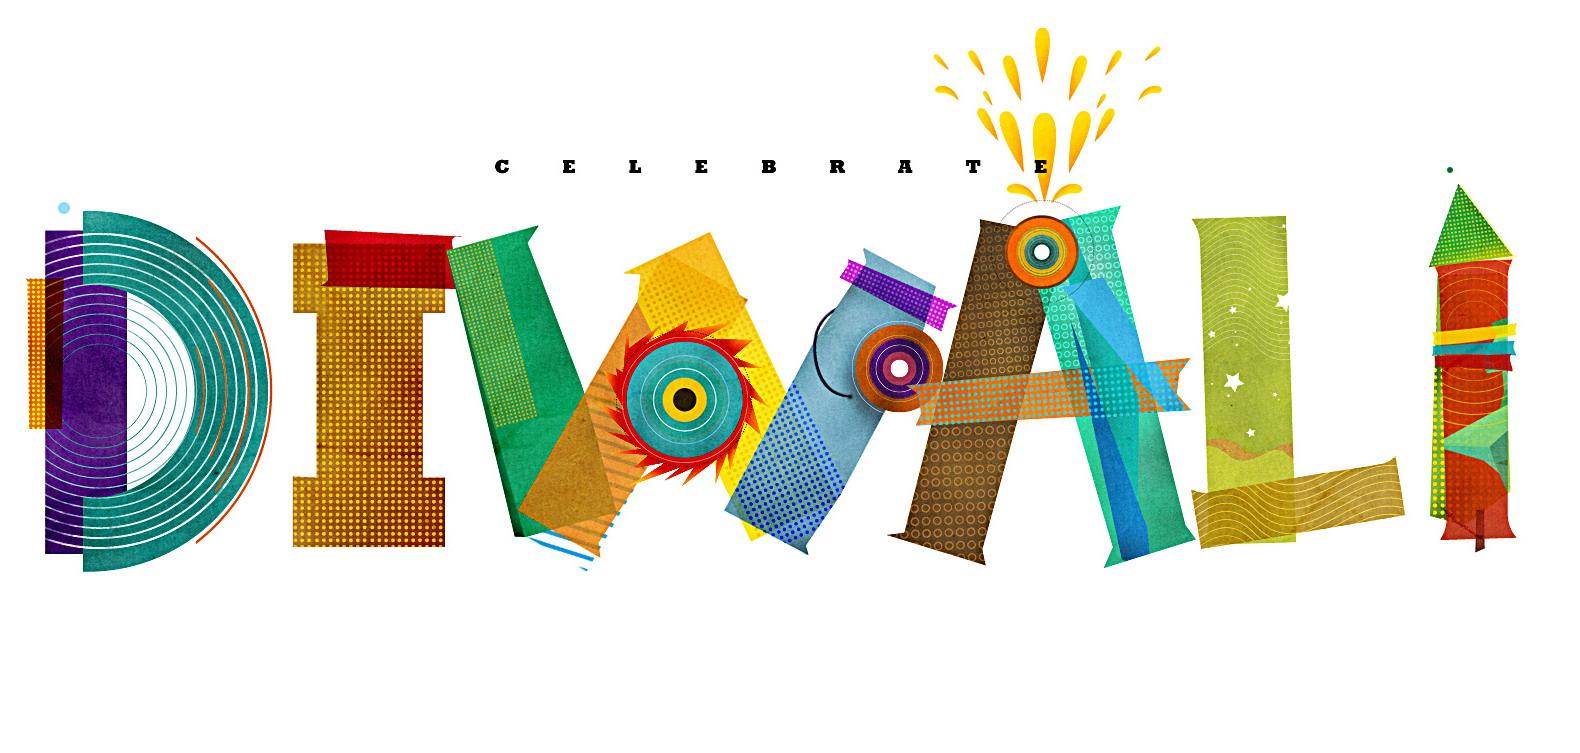 Fireworks clipart diwali cracker Happy Wishes Wallpaper Diwali Fireworks